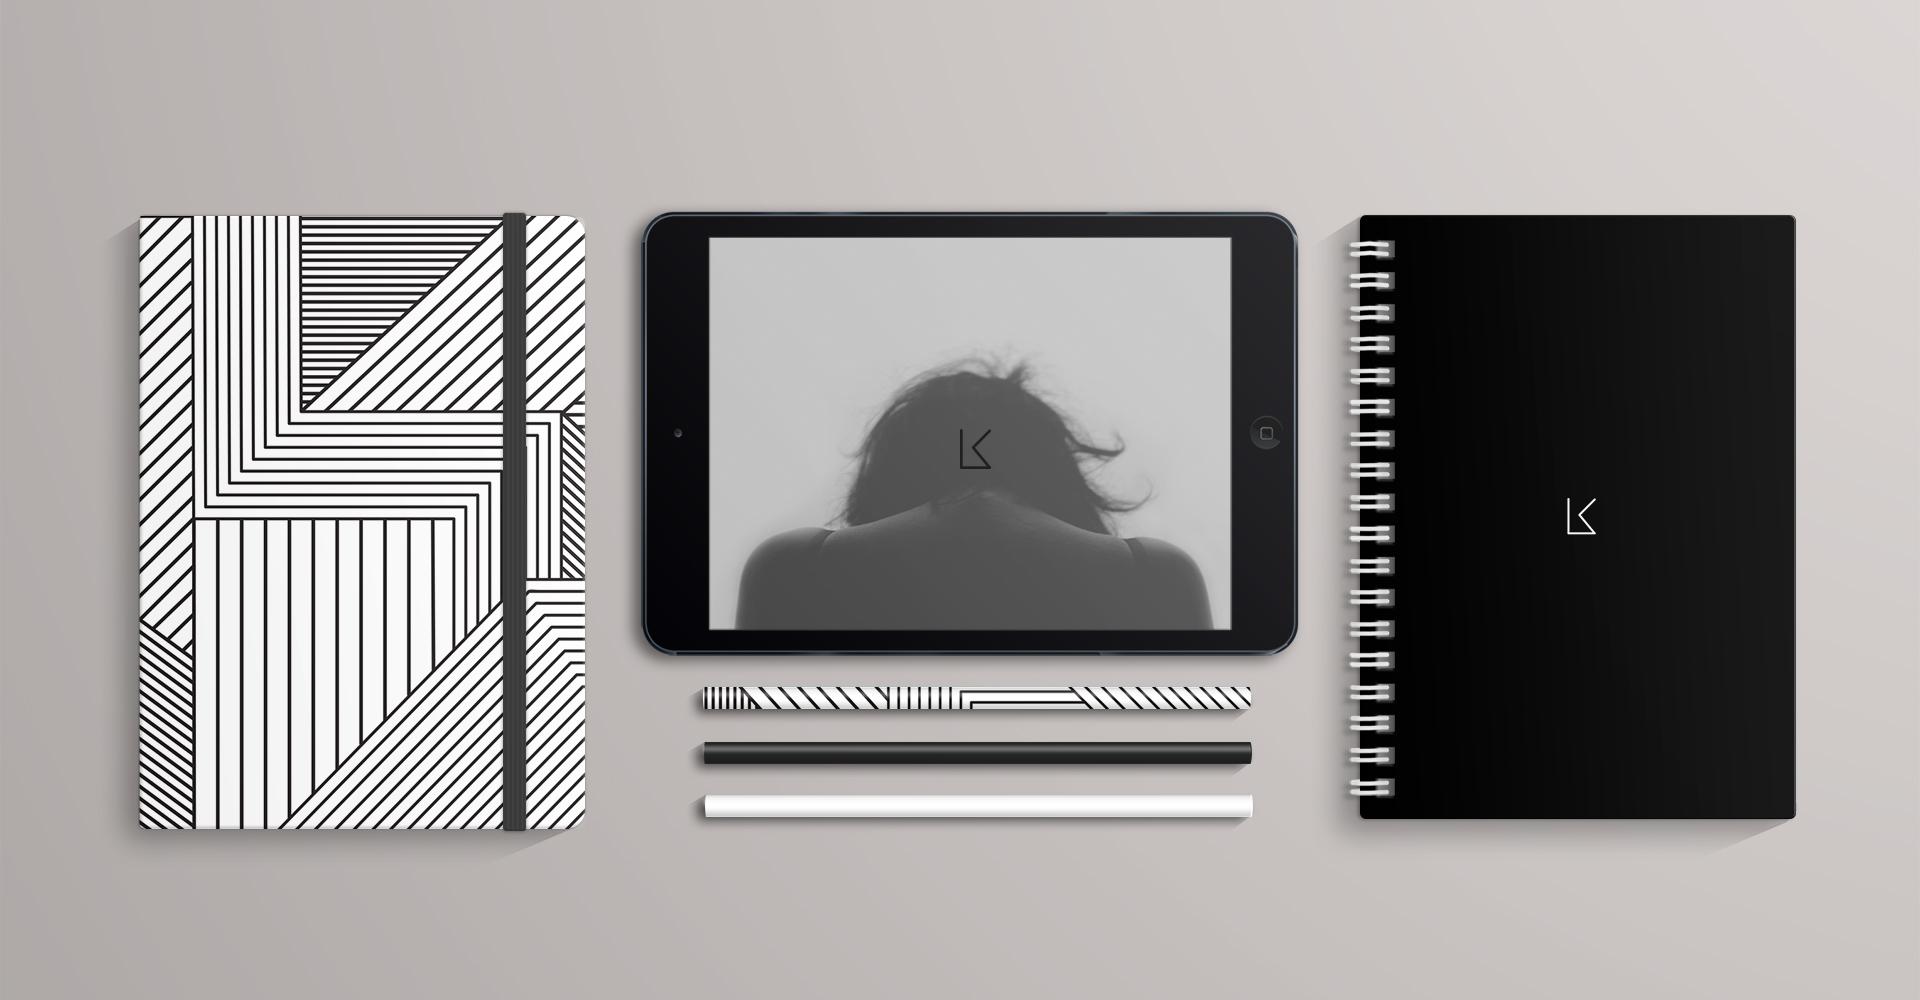 lk_notebook.jpg